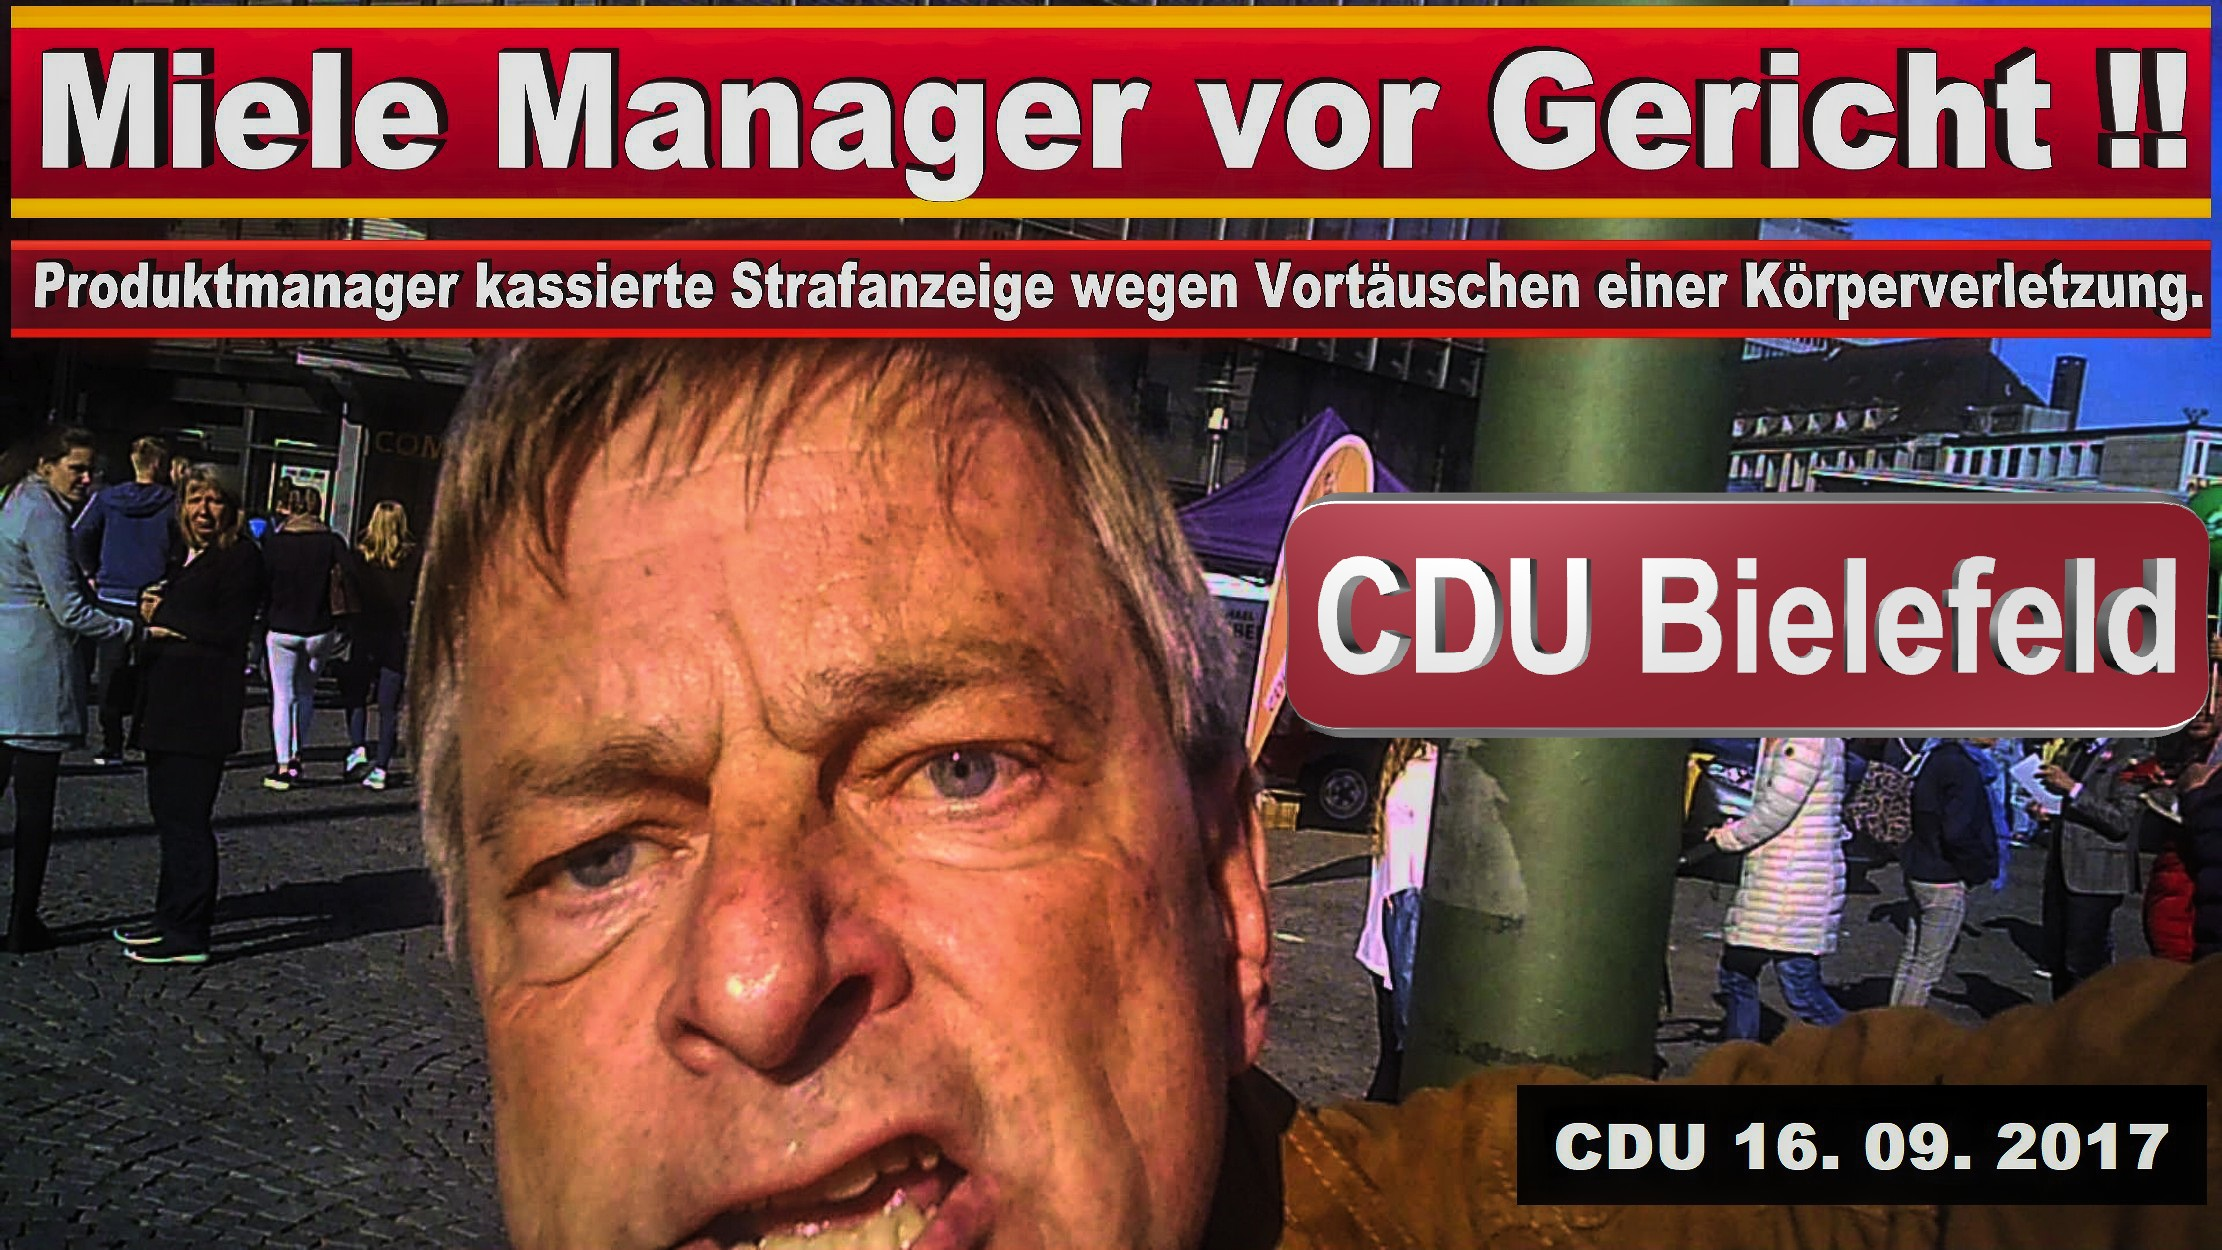 CDU BIELEFELD KANDIDATEN MICHAEL WEBER MIELE GüTERSLOH PRODUKTMANAGER JURIST SPD FDP AFD BIELEFELD